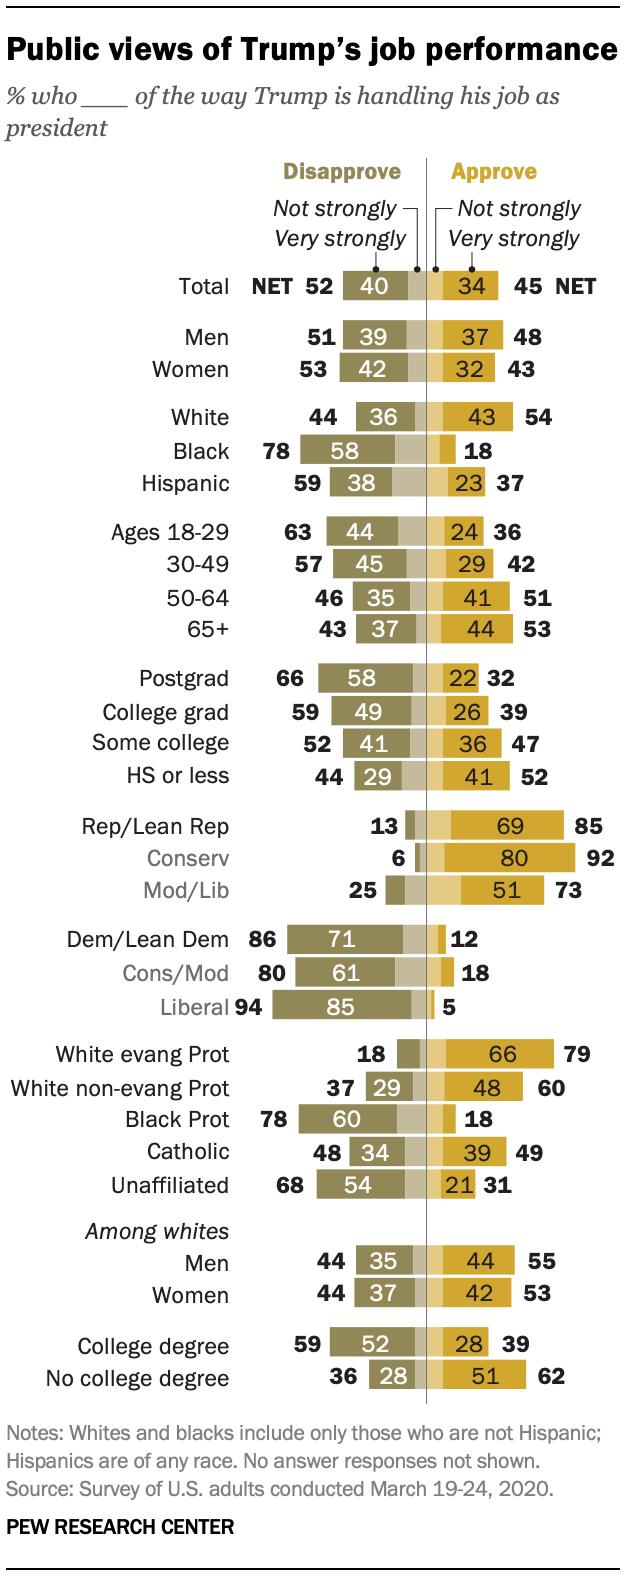 Public views of Trump's job performance